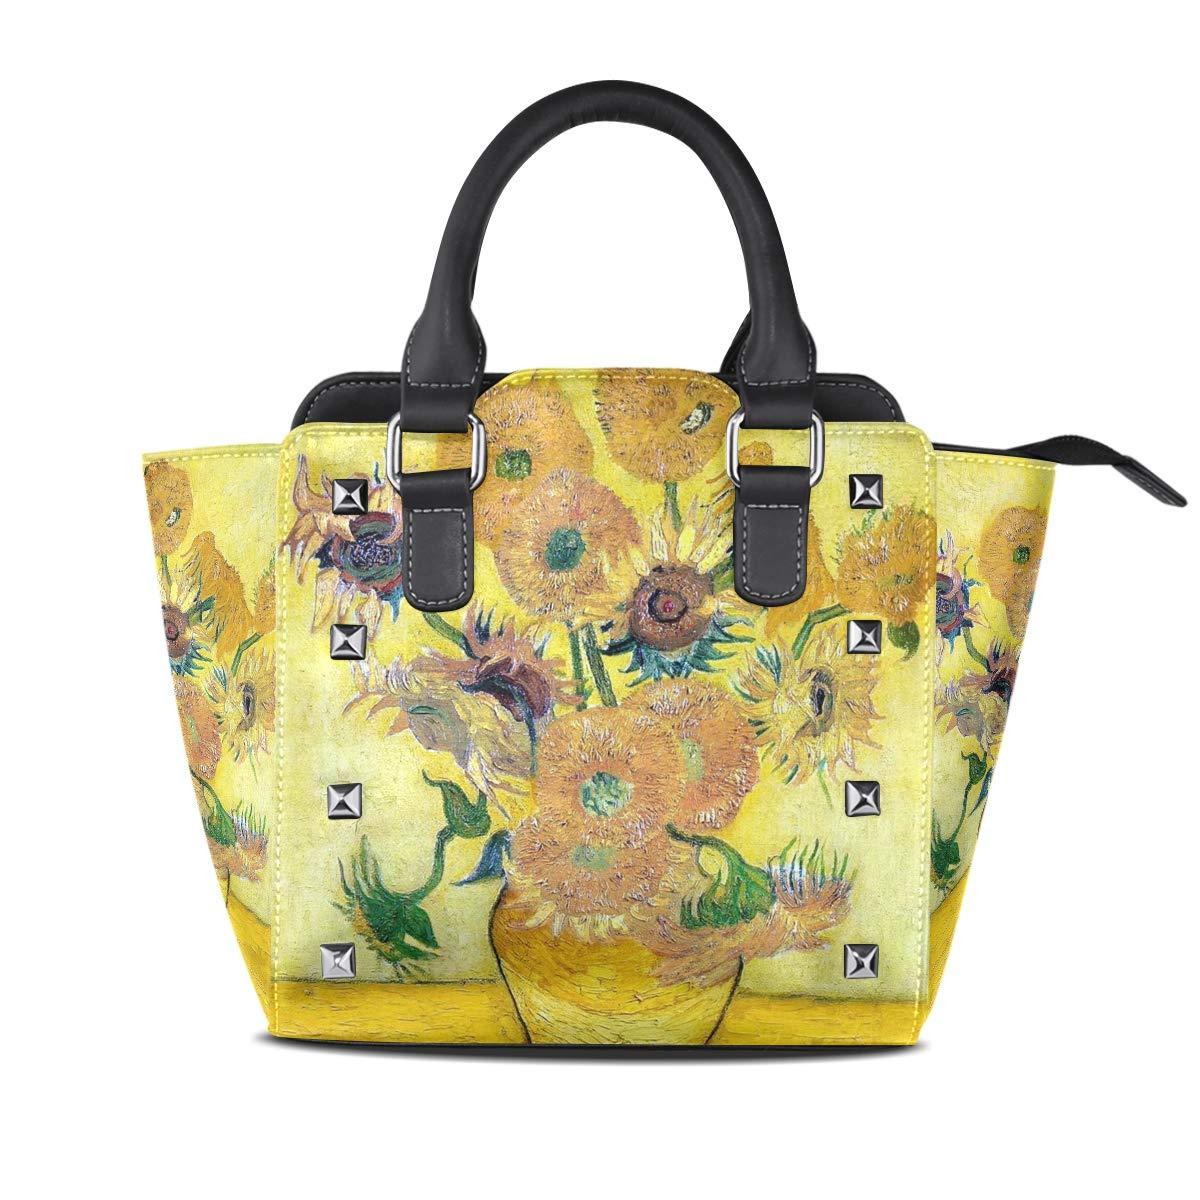 Design4 Handbag Pink Beautiful Flowers Genuine Leather Tote Rivet Bag Shoulder Strap Top Handle Women